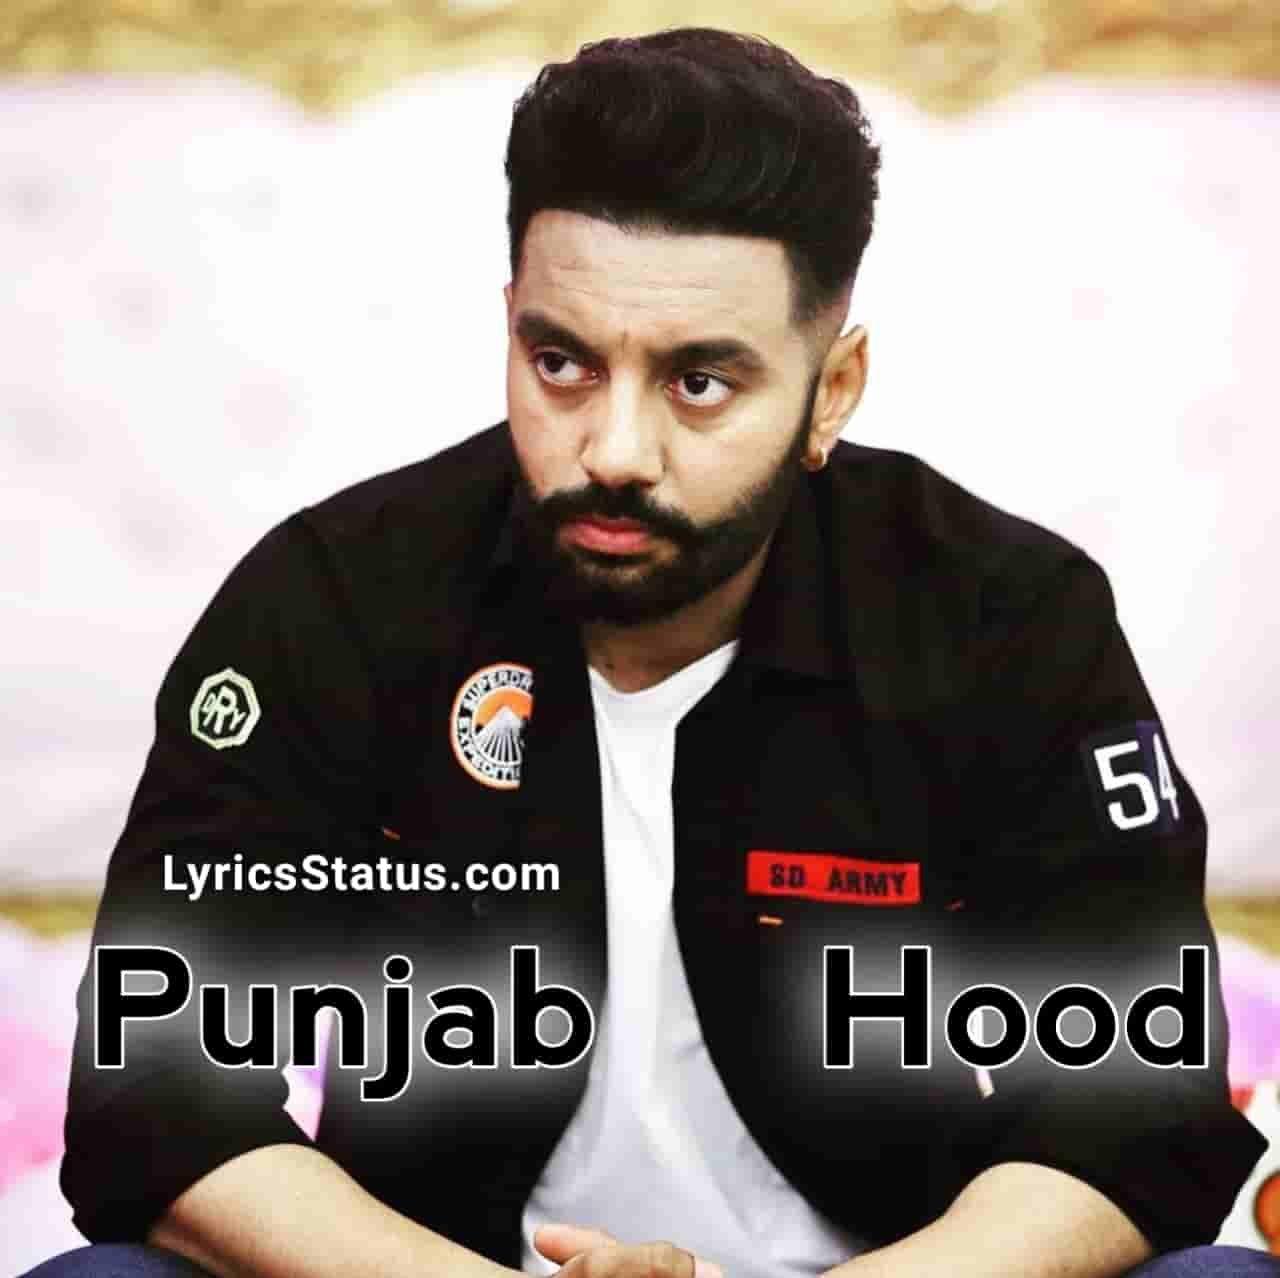 Sippy Gill Punjab Hood Lyrics Status Download Punjabi Song Ni Main Kaahda Vailpuna Chhadya Bacha Bacha Badmash Ho Giya Black Background